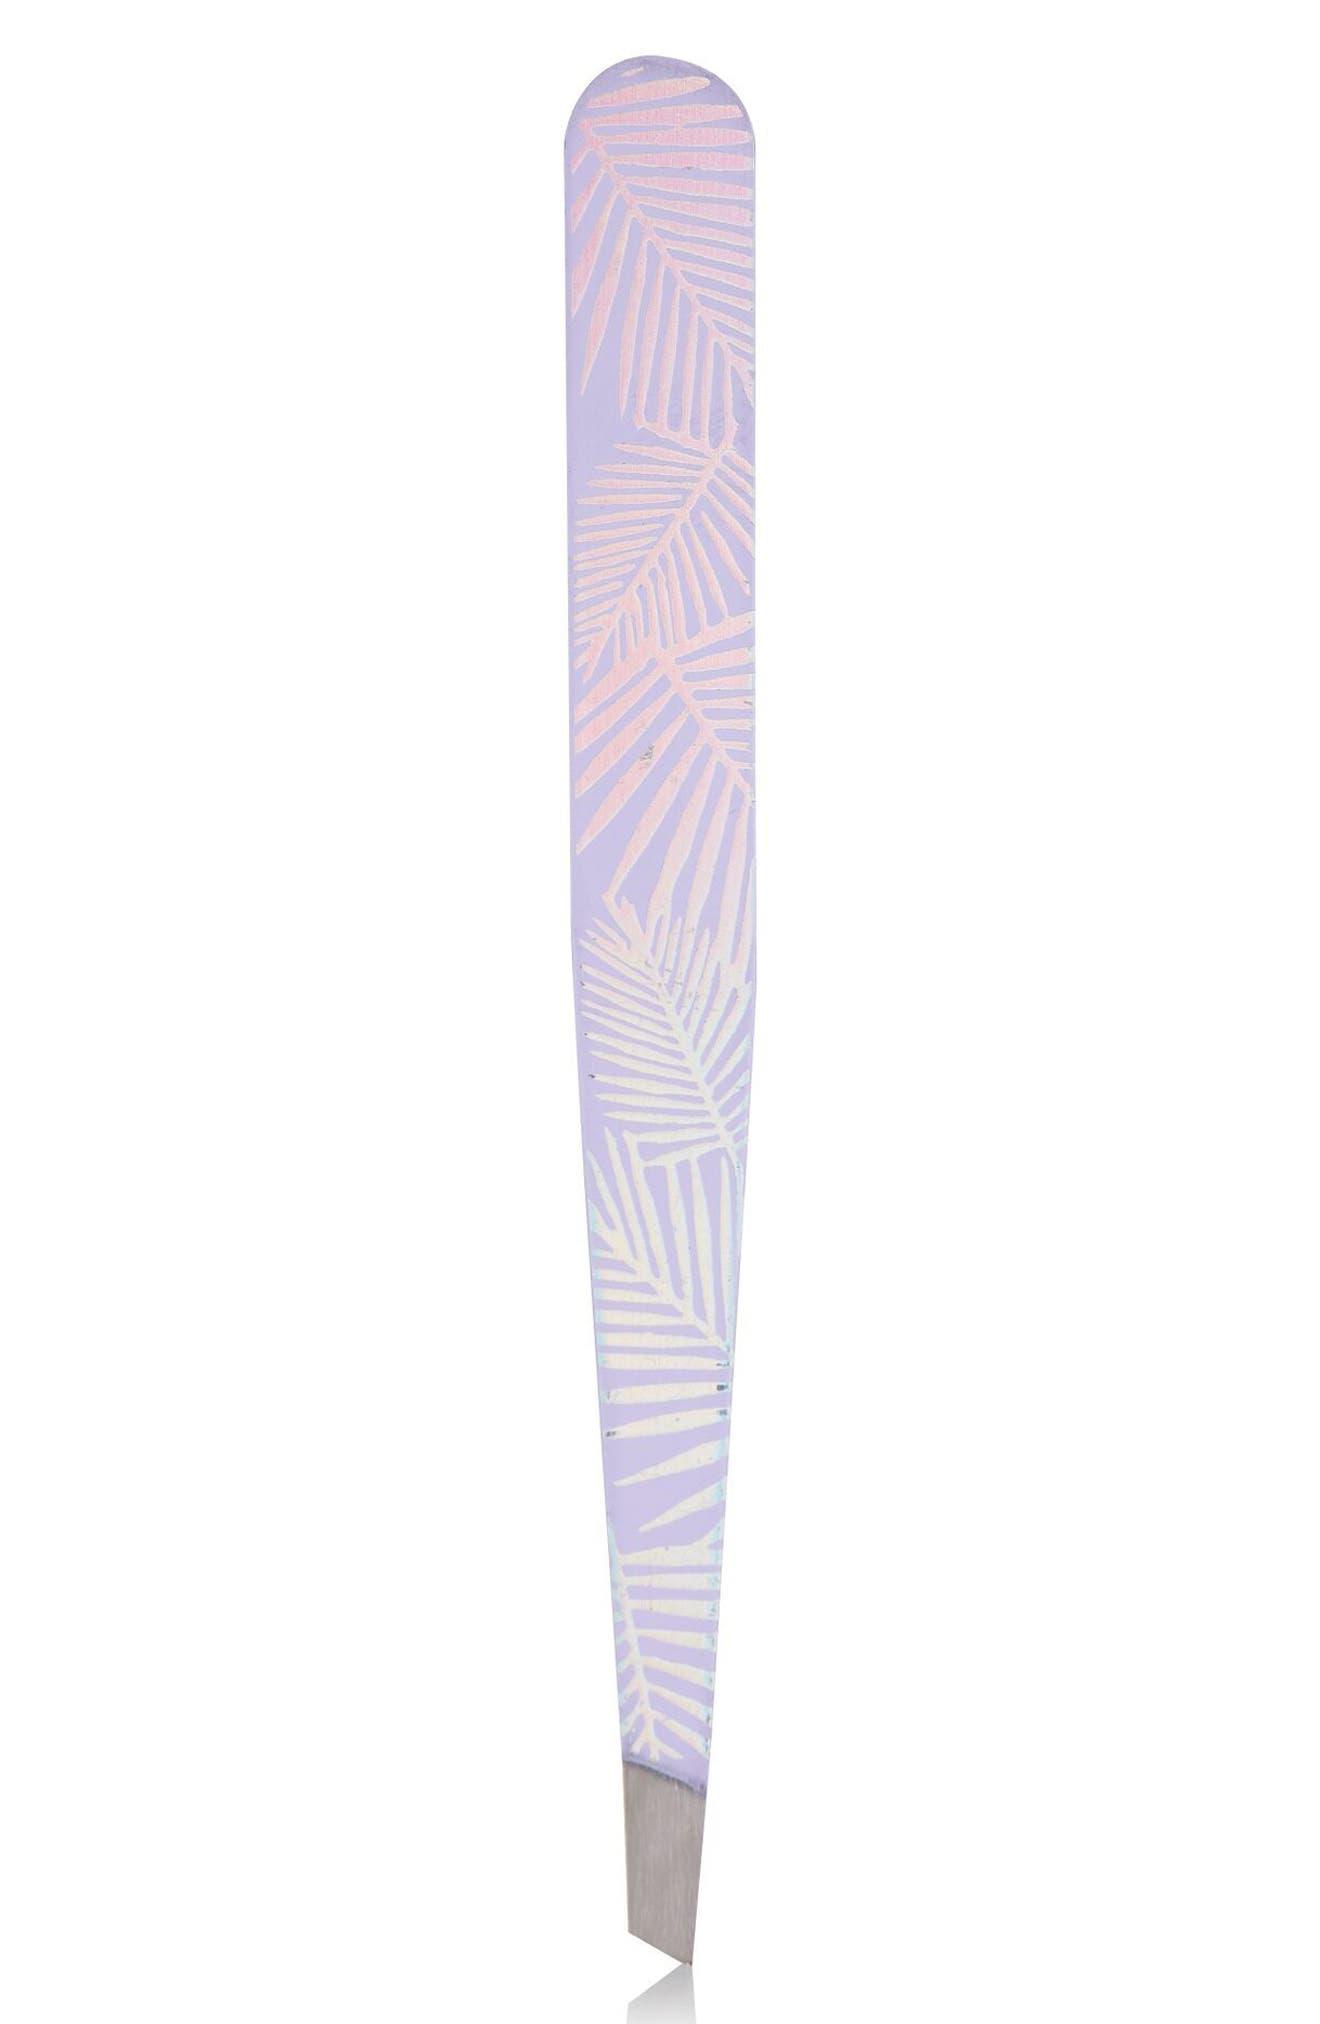 Main Image - Skinny Dip Lilac with Halo Palm Tweezer